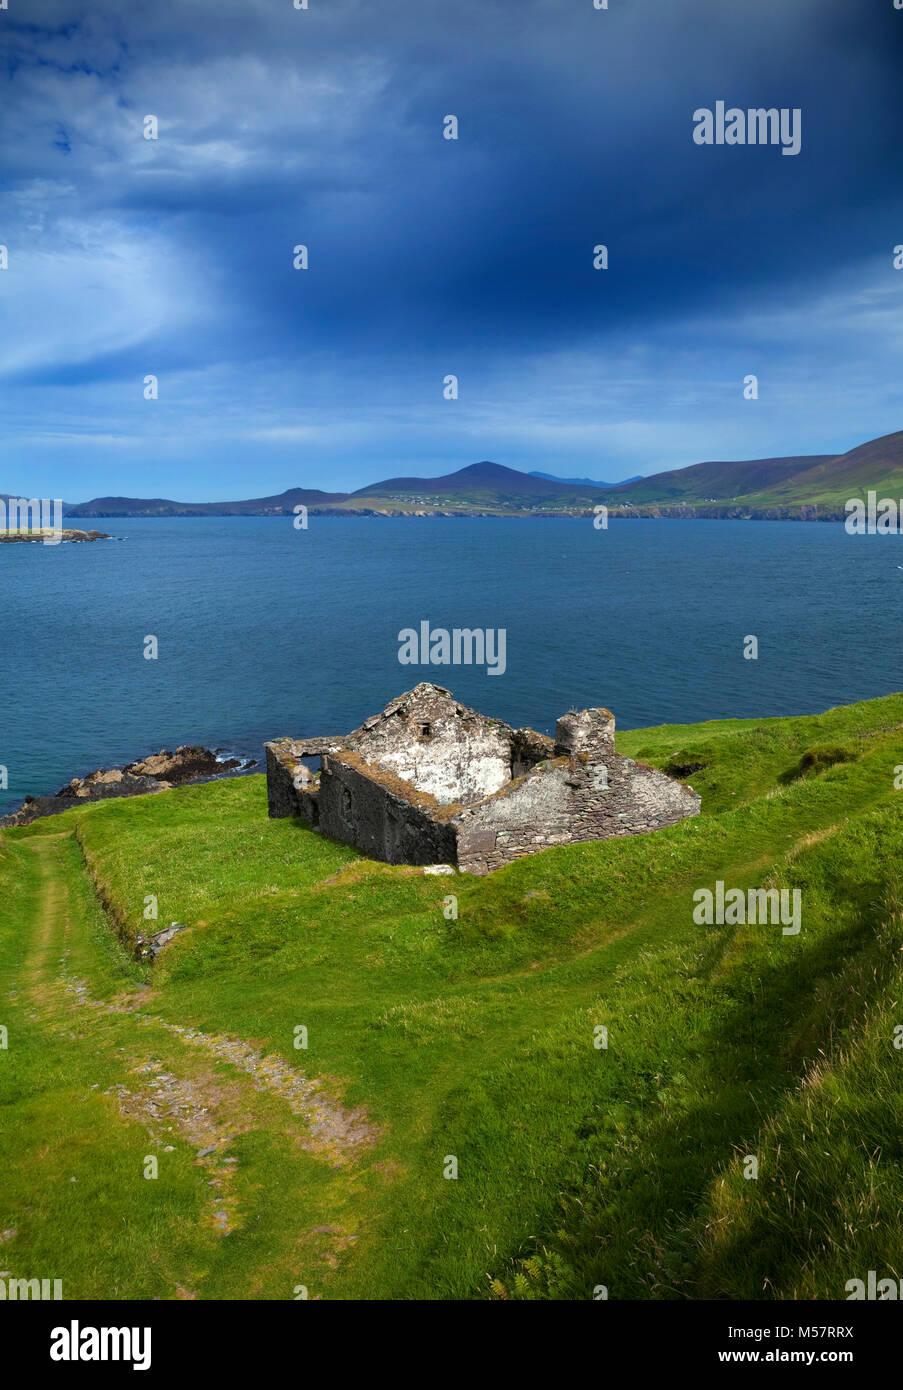 Deserted Cottage on Great Blasket Island, The Blasket Islands, Off Slea Head on the Dingle Peninsula, County Kerry, - Stock Image